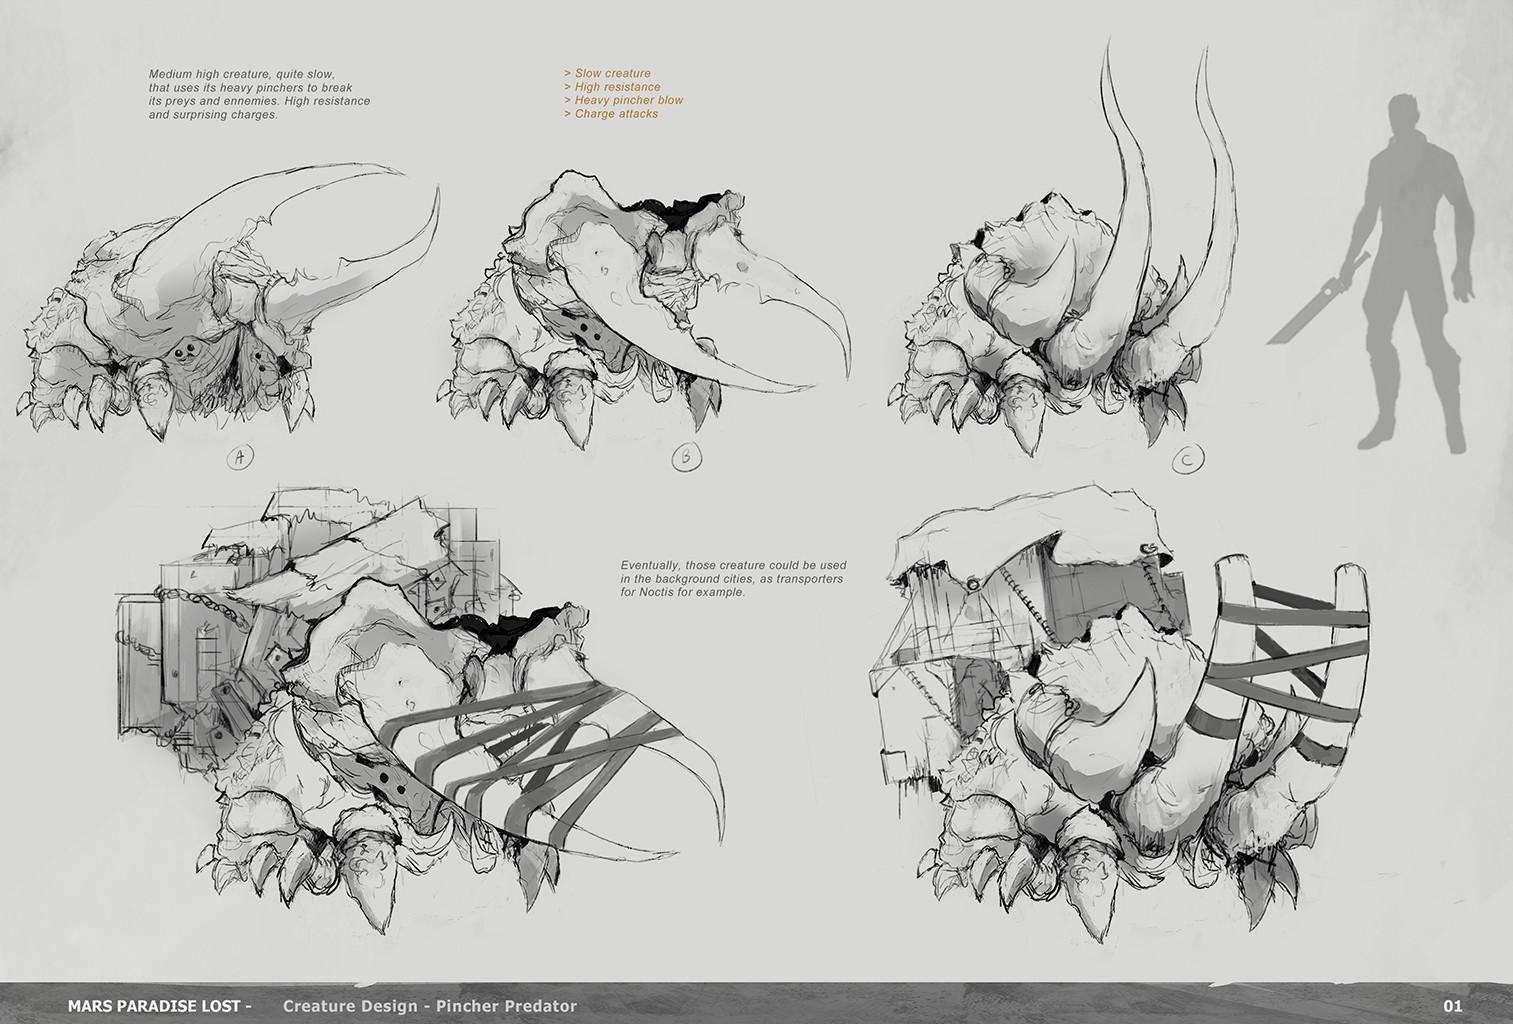 Alexandre chaudret mpl creature pincher research01